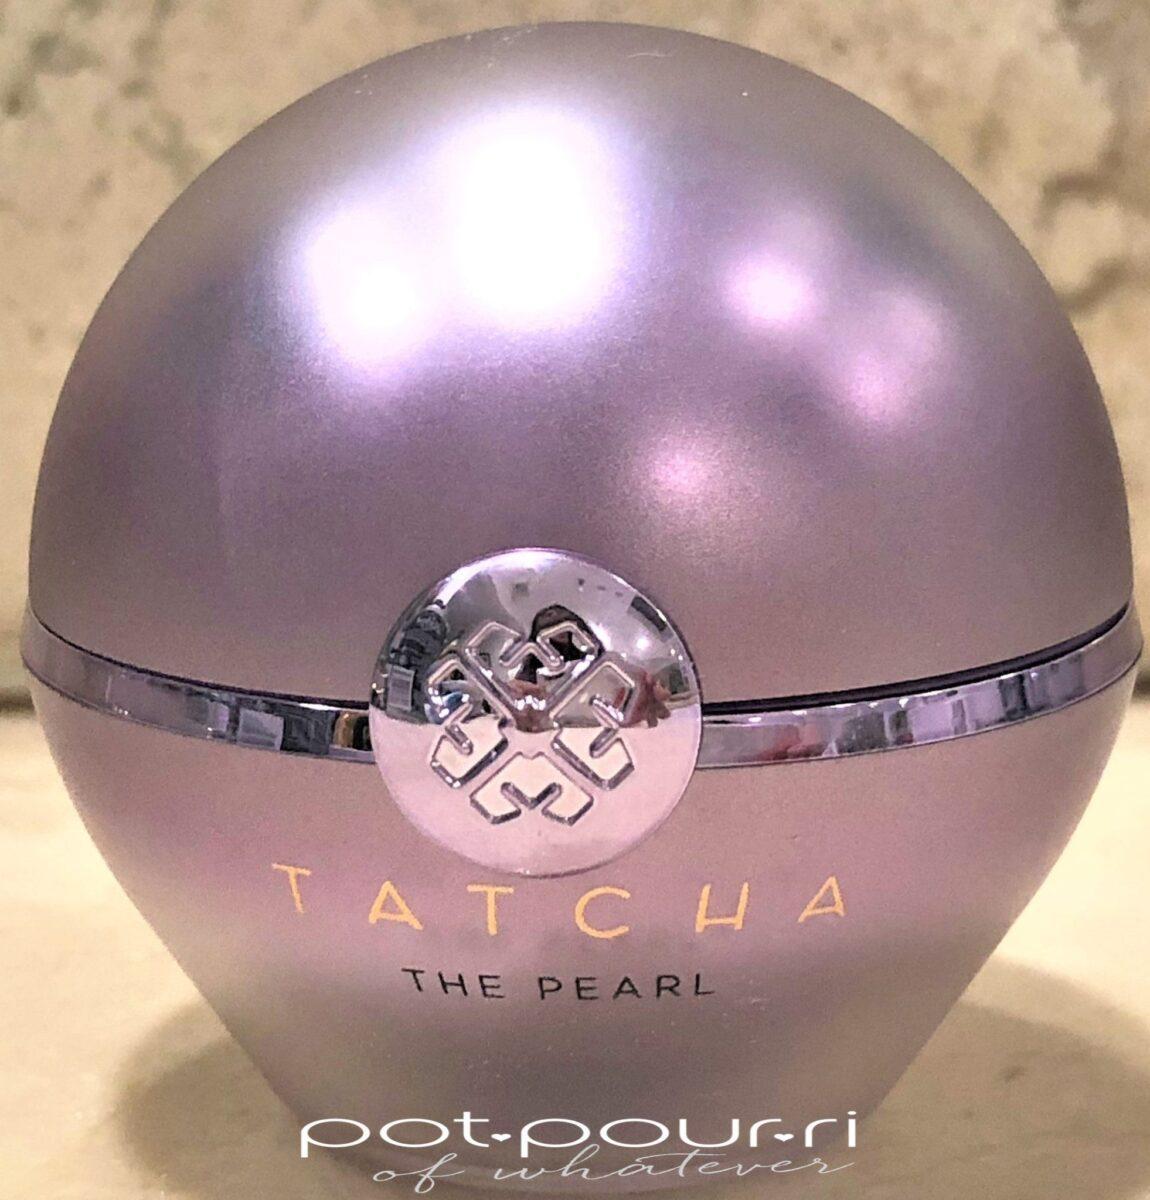 TATCHA-THE-PEARL-JAR-LILAC-PEARL-SPHERE-OPALESCENT